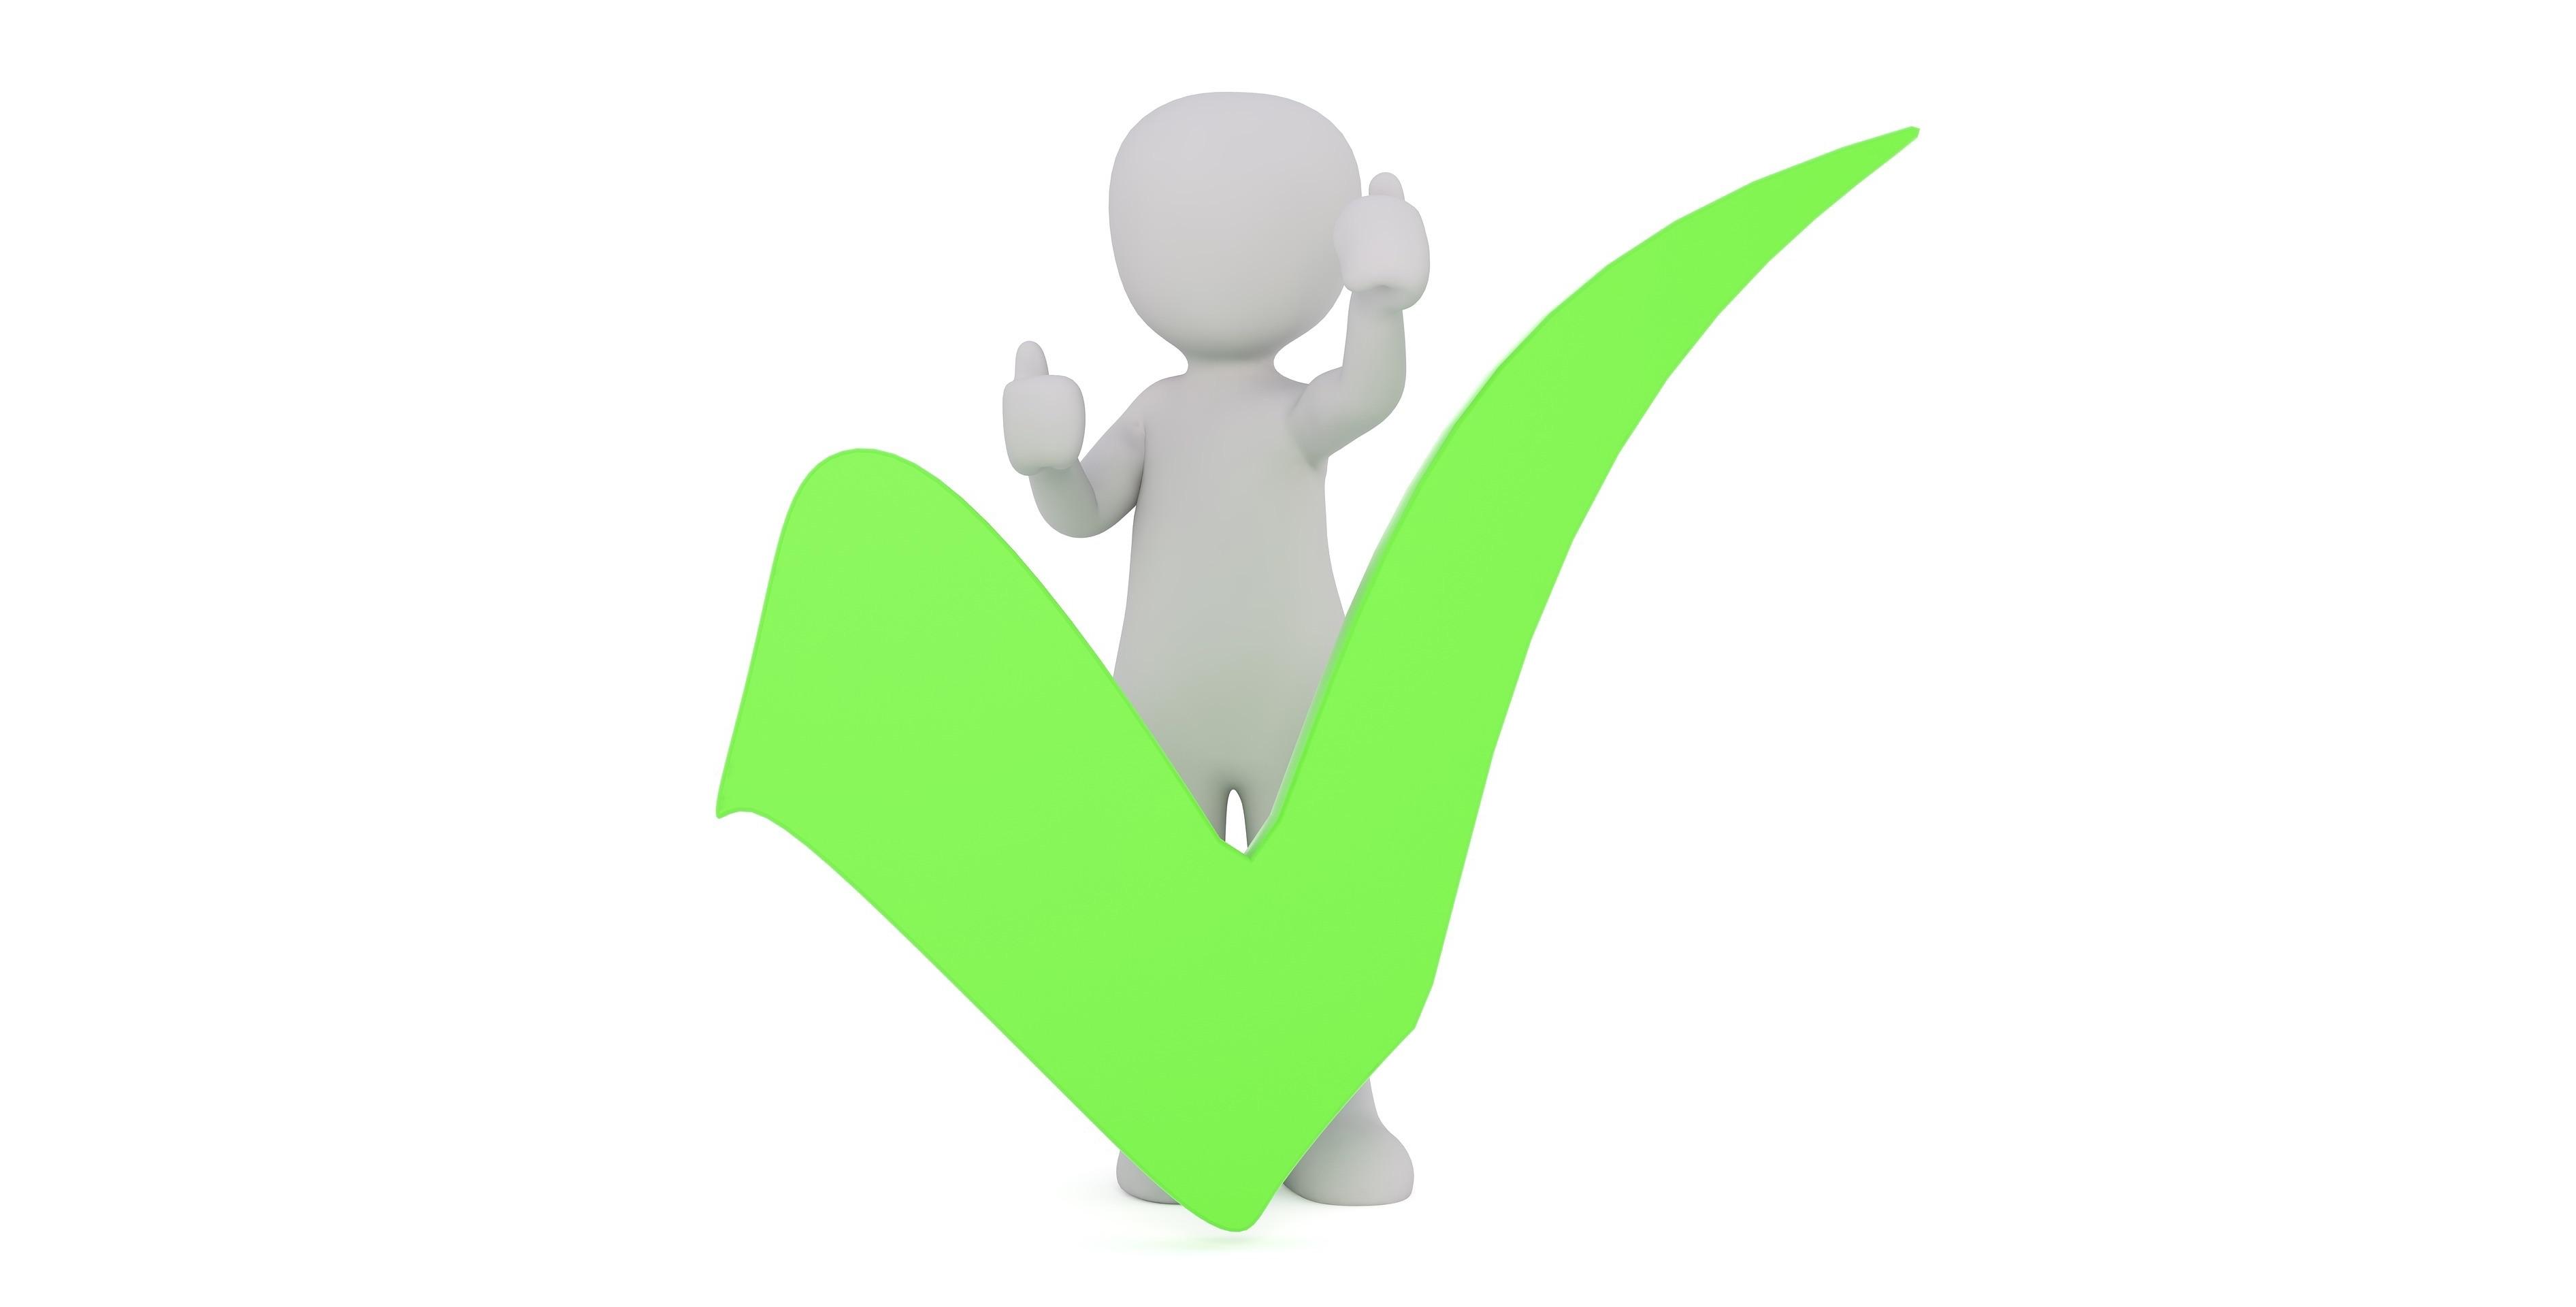 Egzamin praktyczny do licencji CPL(A)